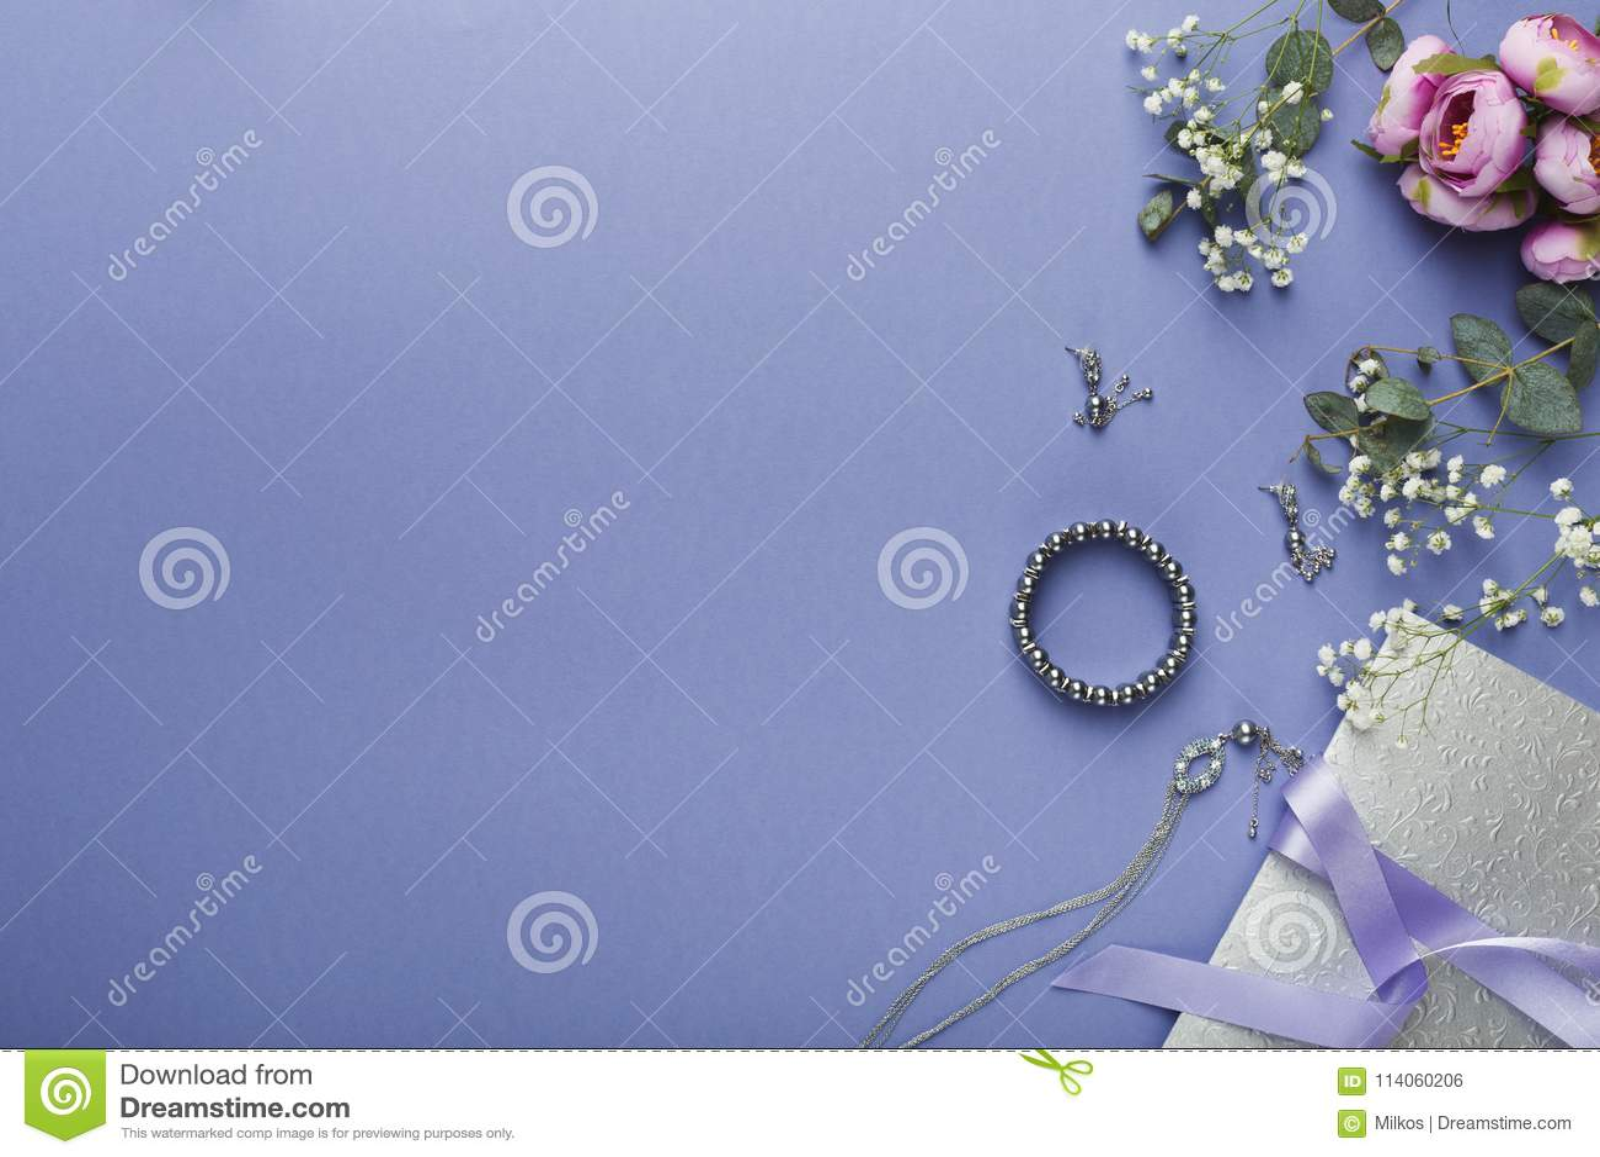 Choosing Wedding Jewelry Background